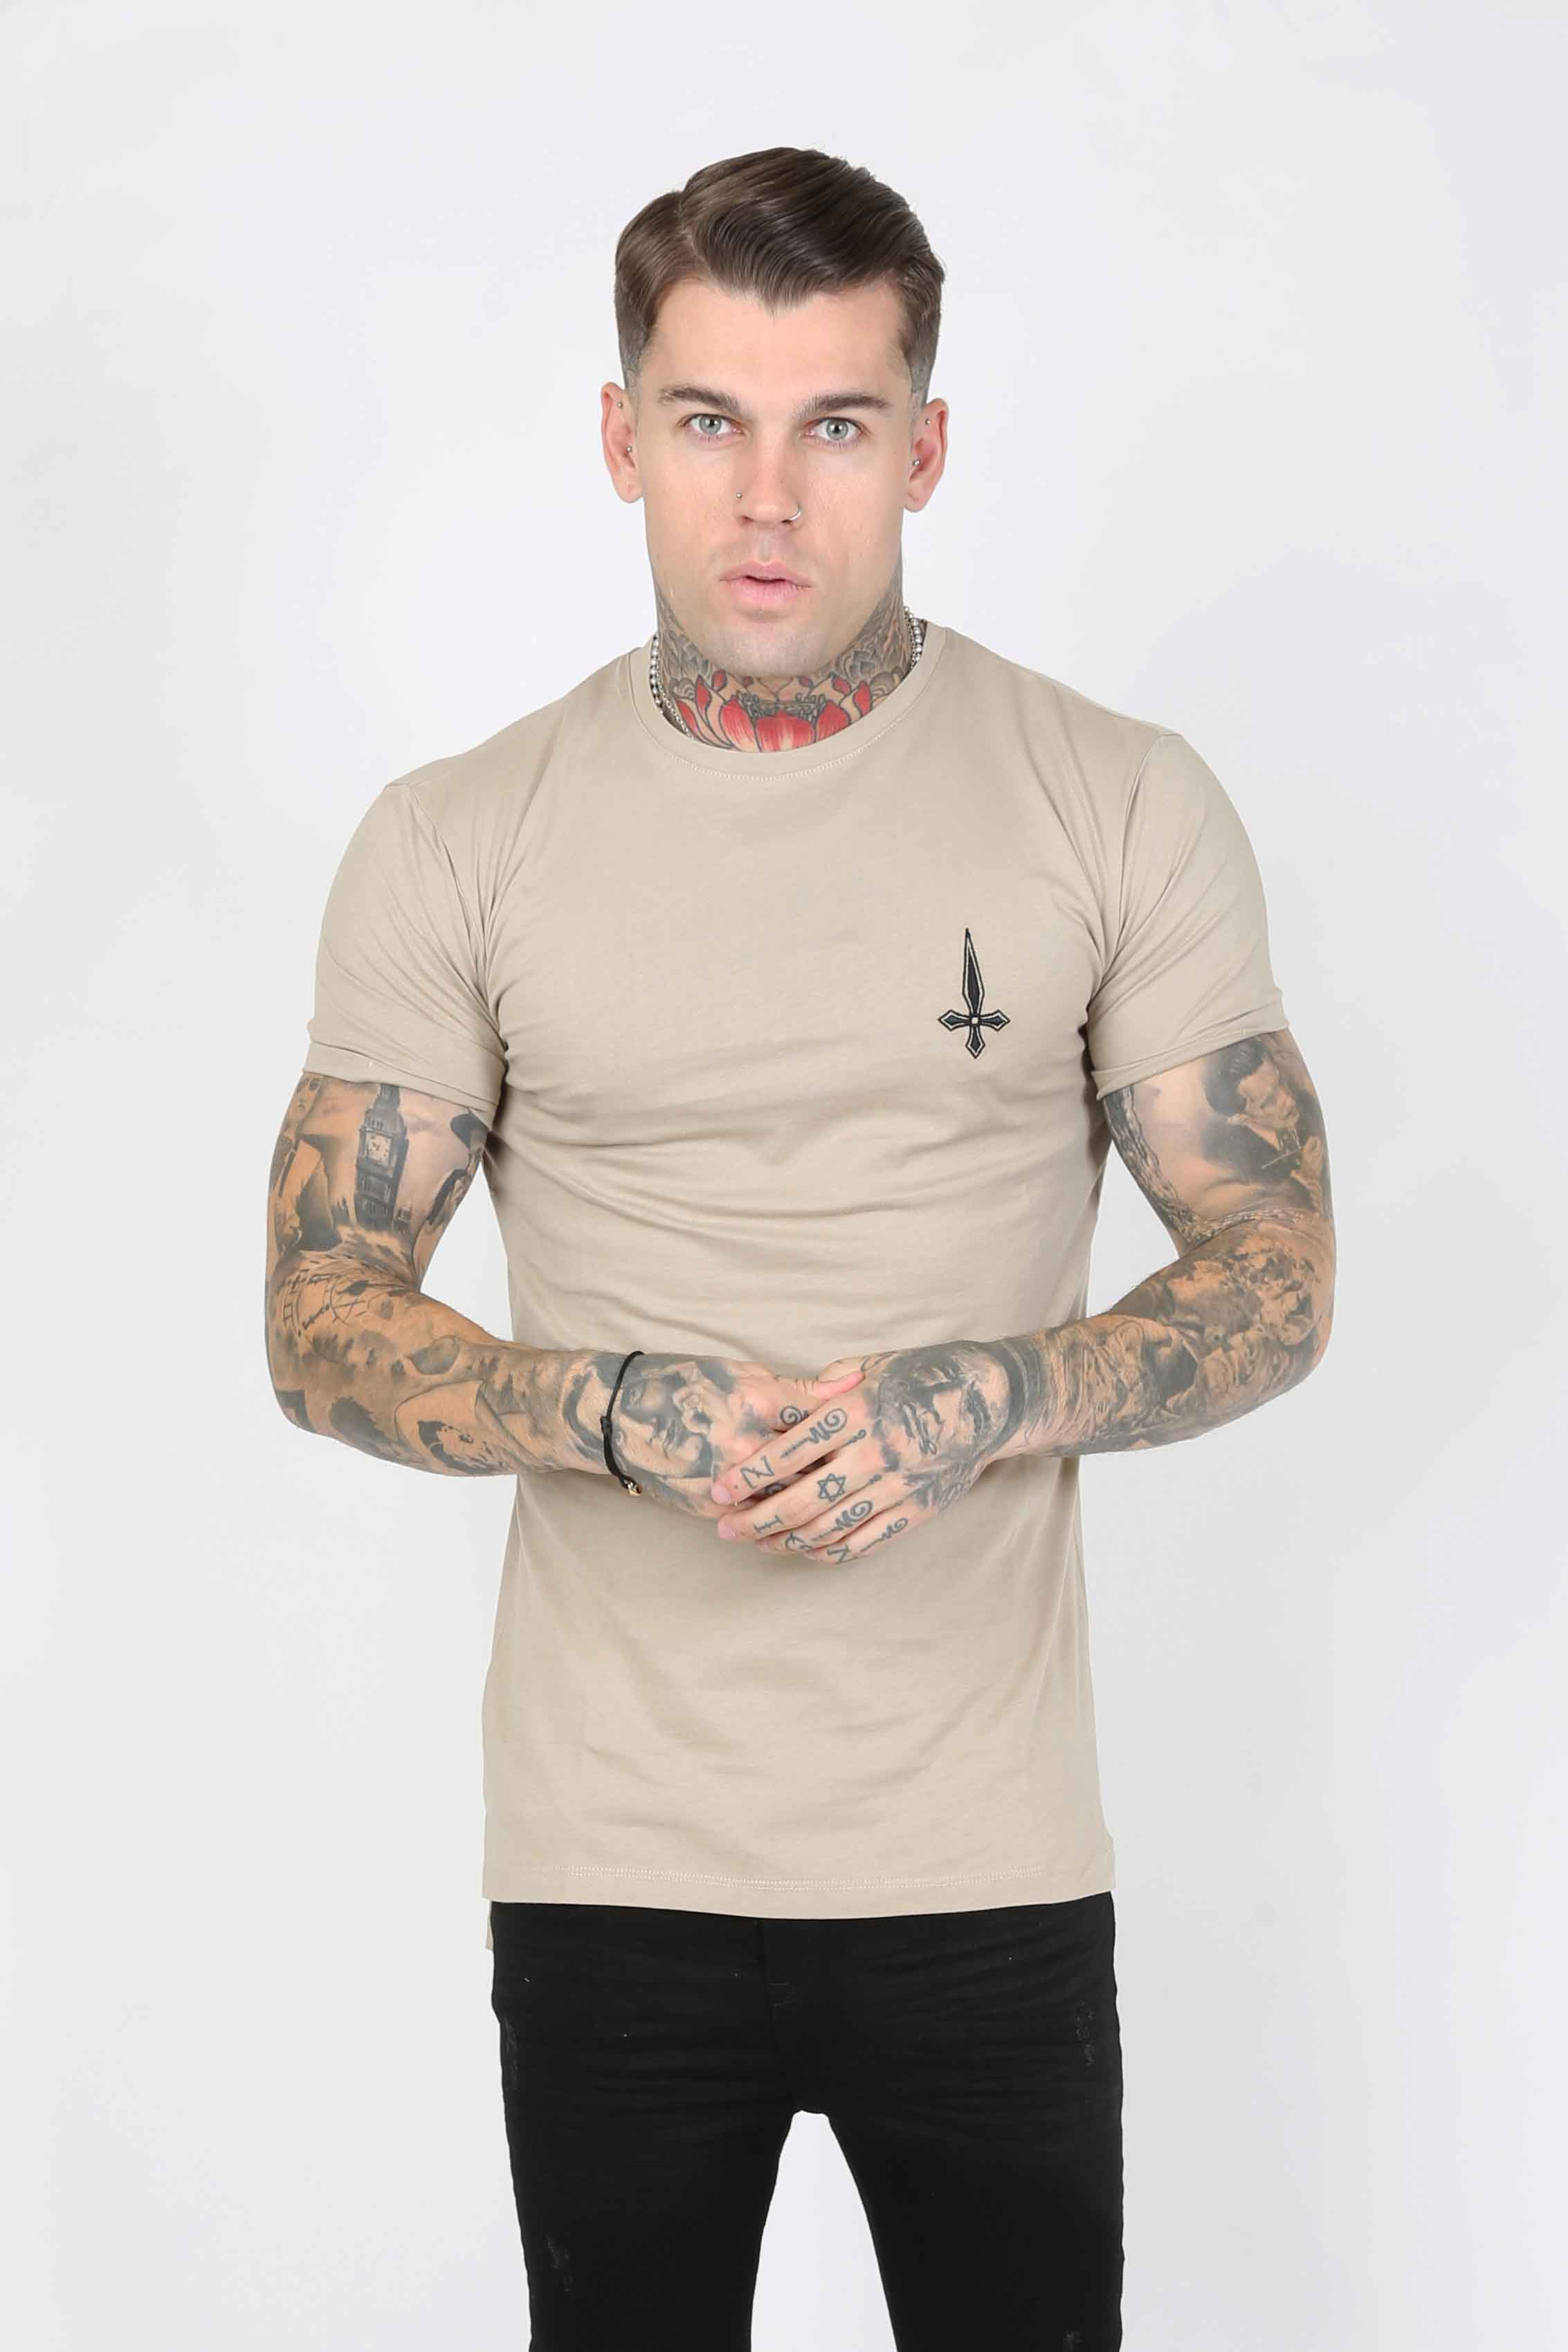 Core Twinpack Men's T-Shirt - Black/Taupe, Small